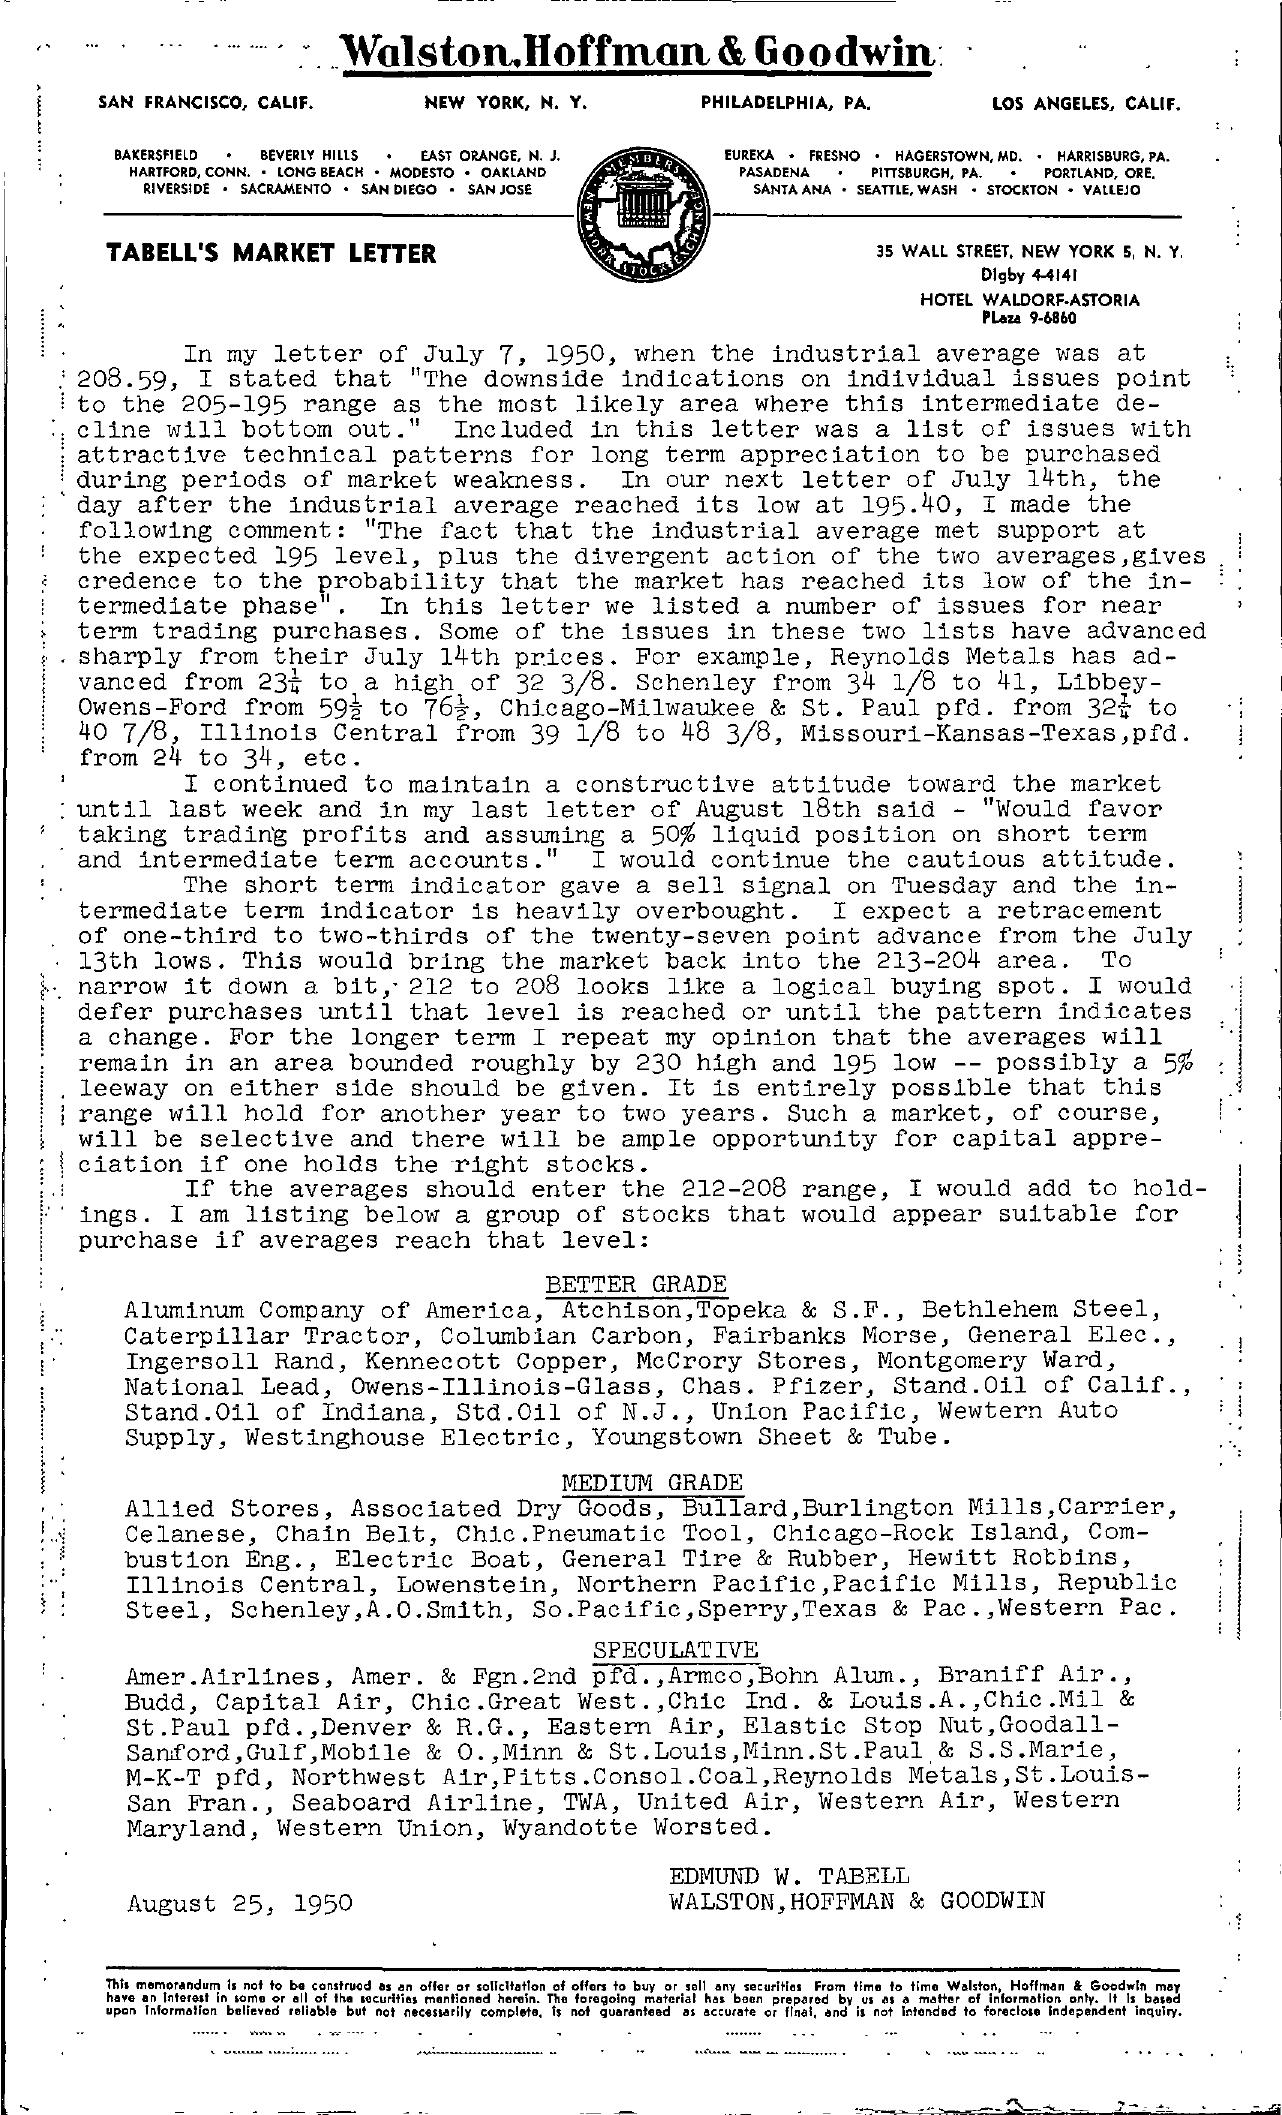 Tabell's Market Letter - August 25, 1950